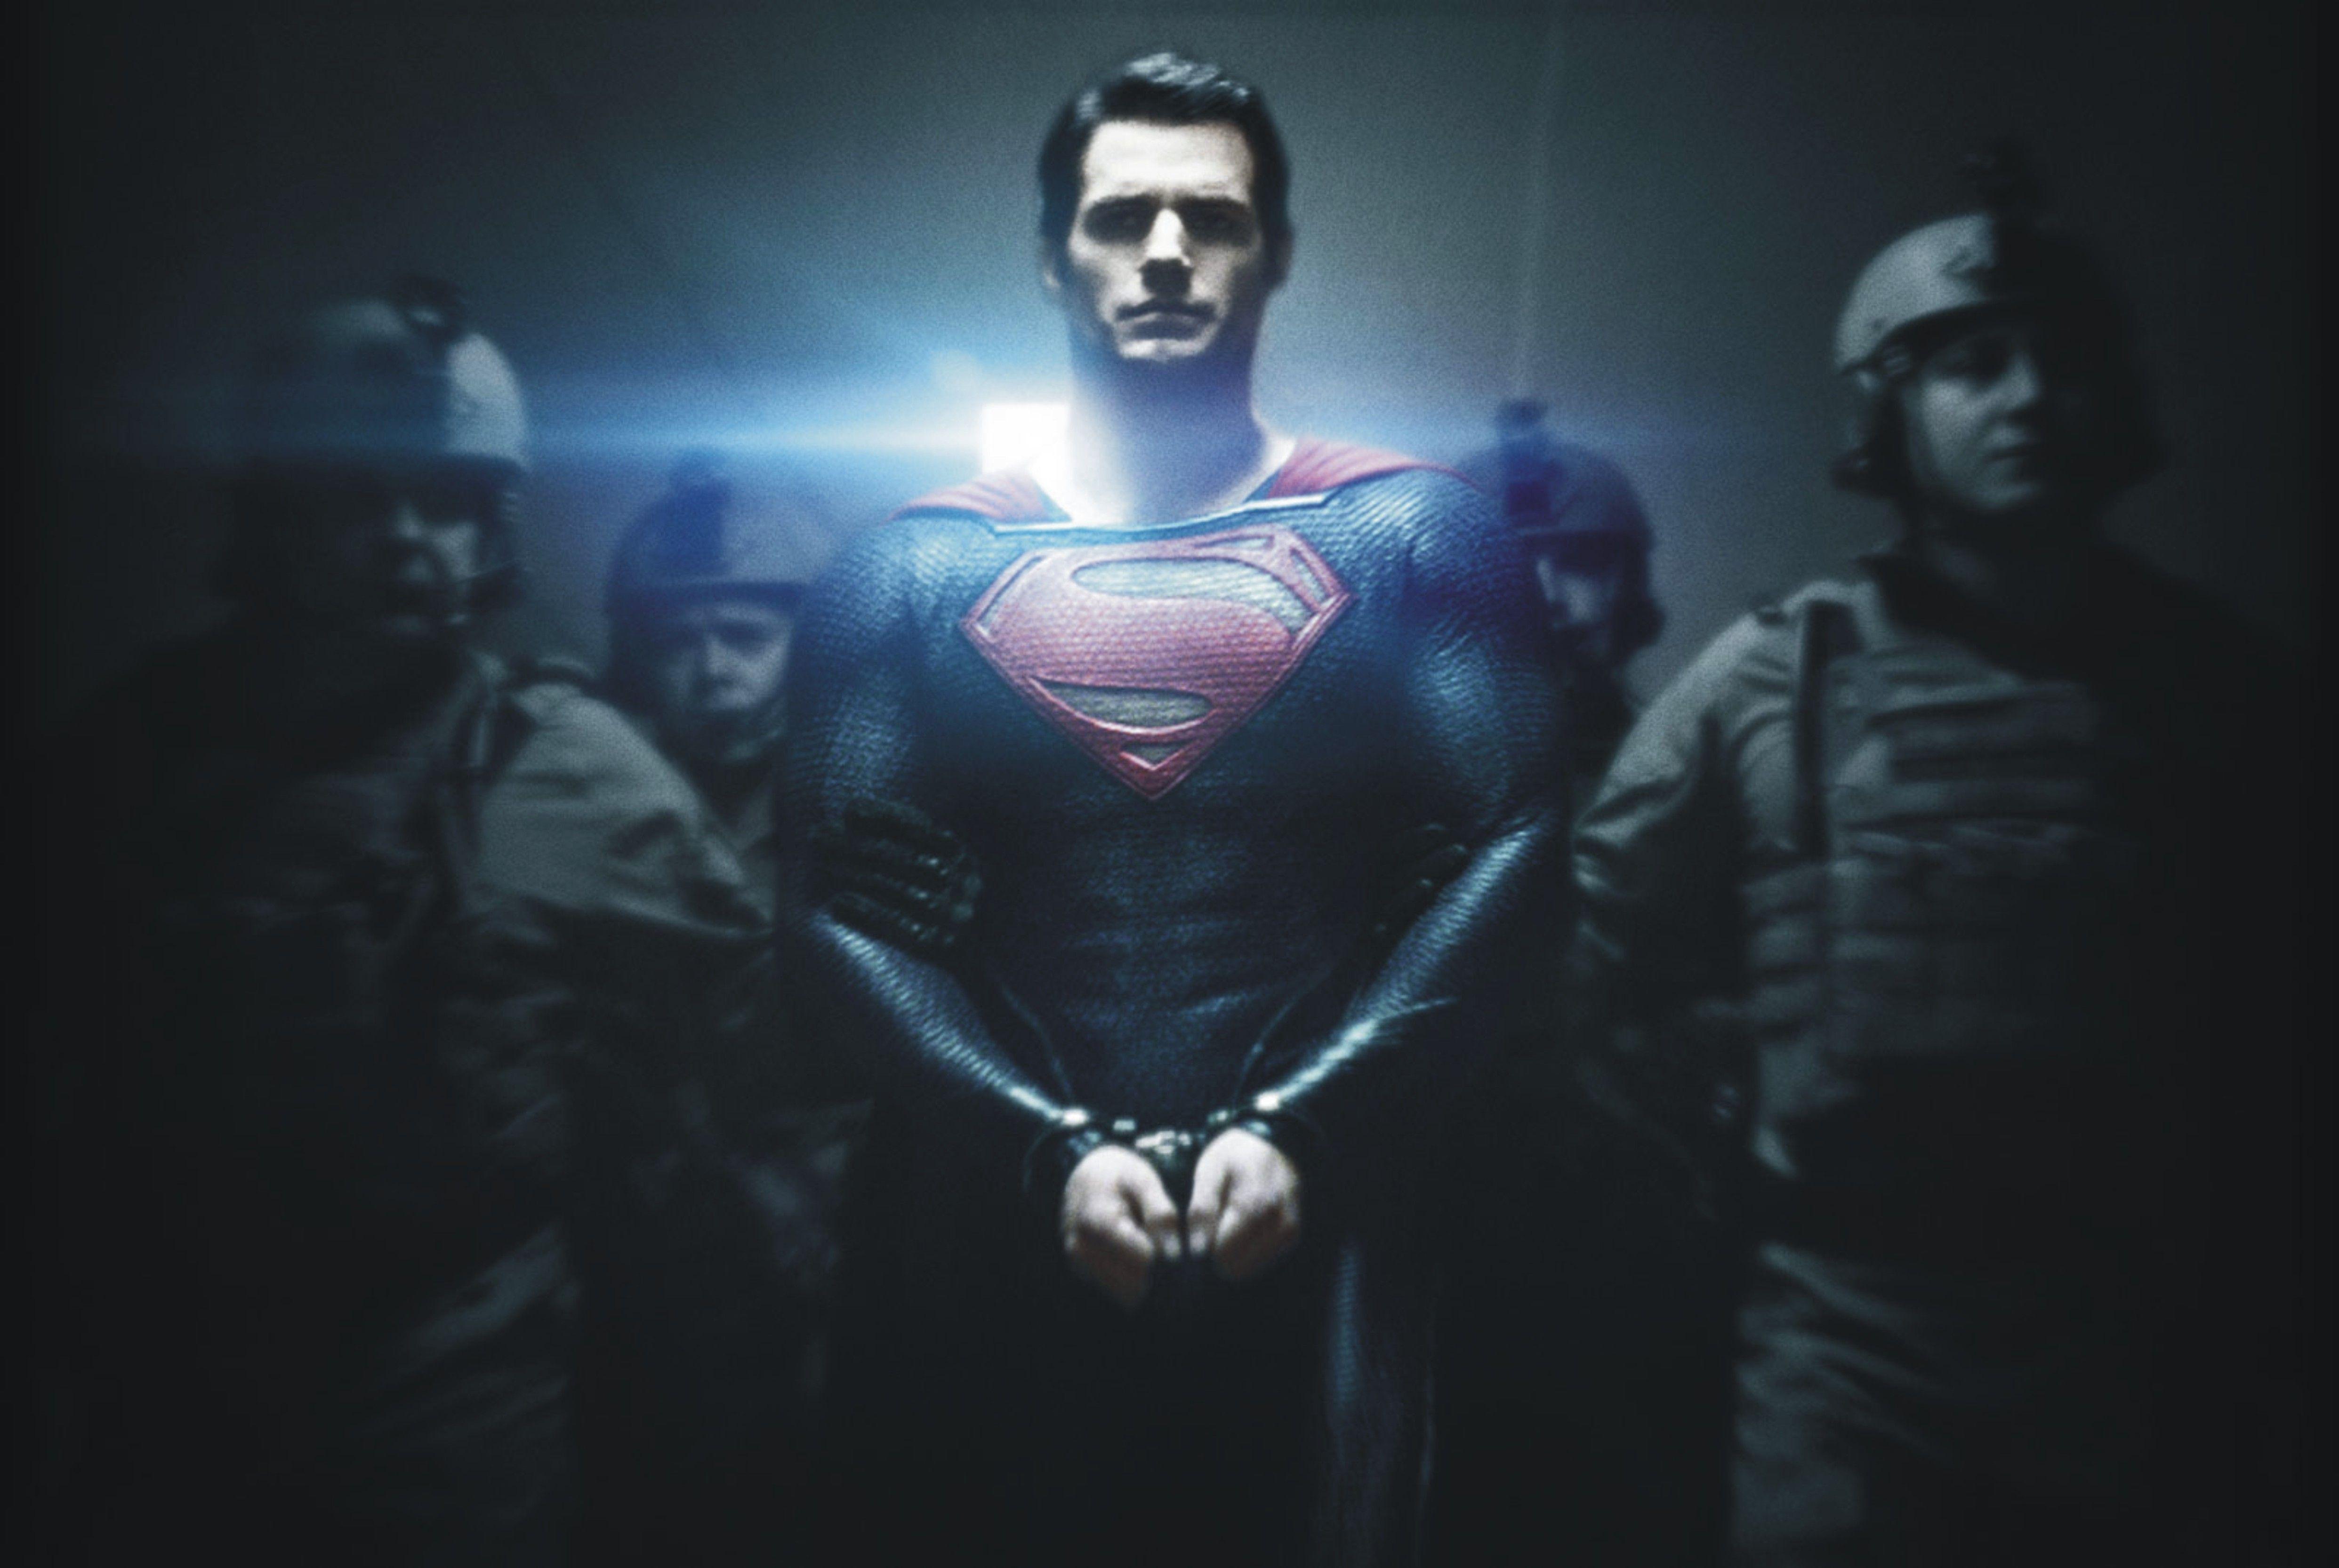 Superman Man Of Steel Movie Henry Cavill DC Comics Superheroes Superhero